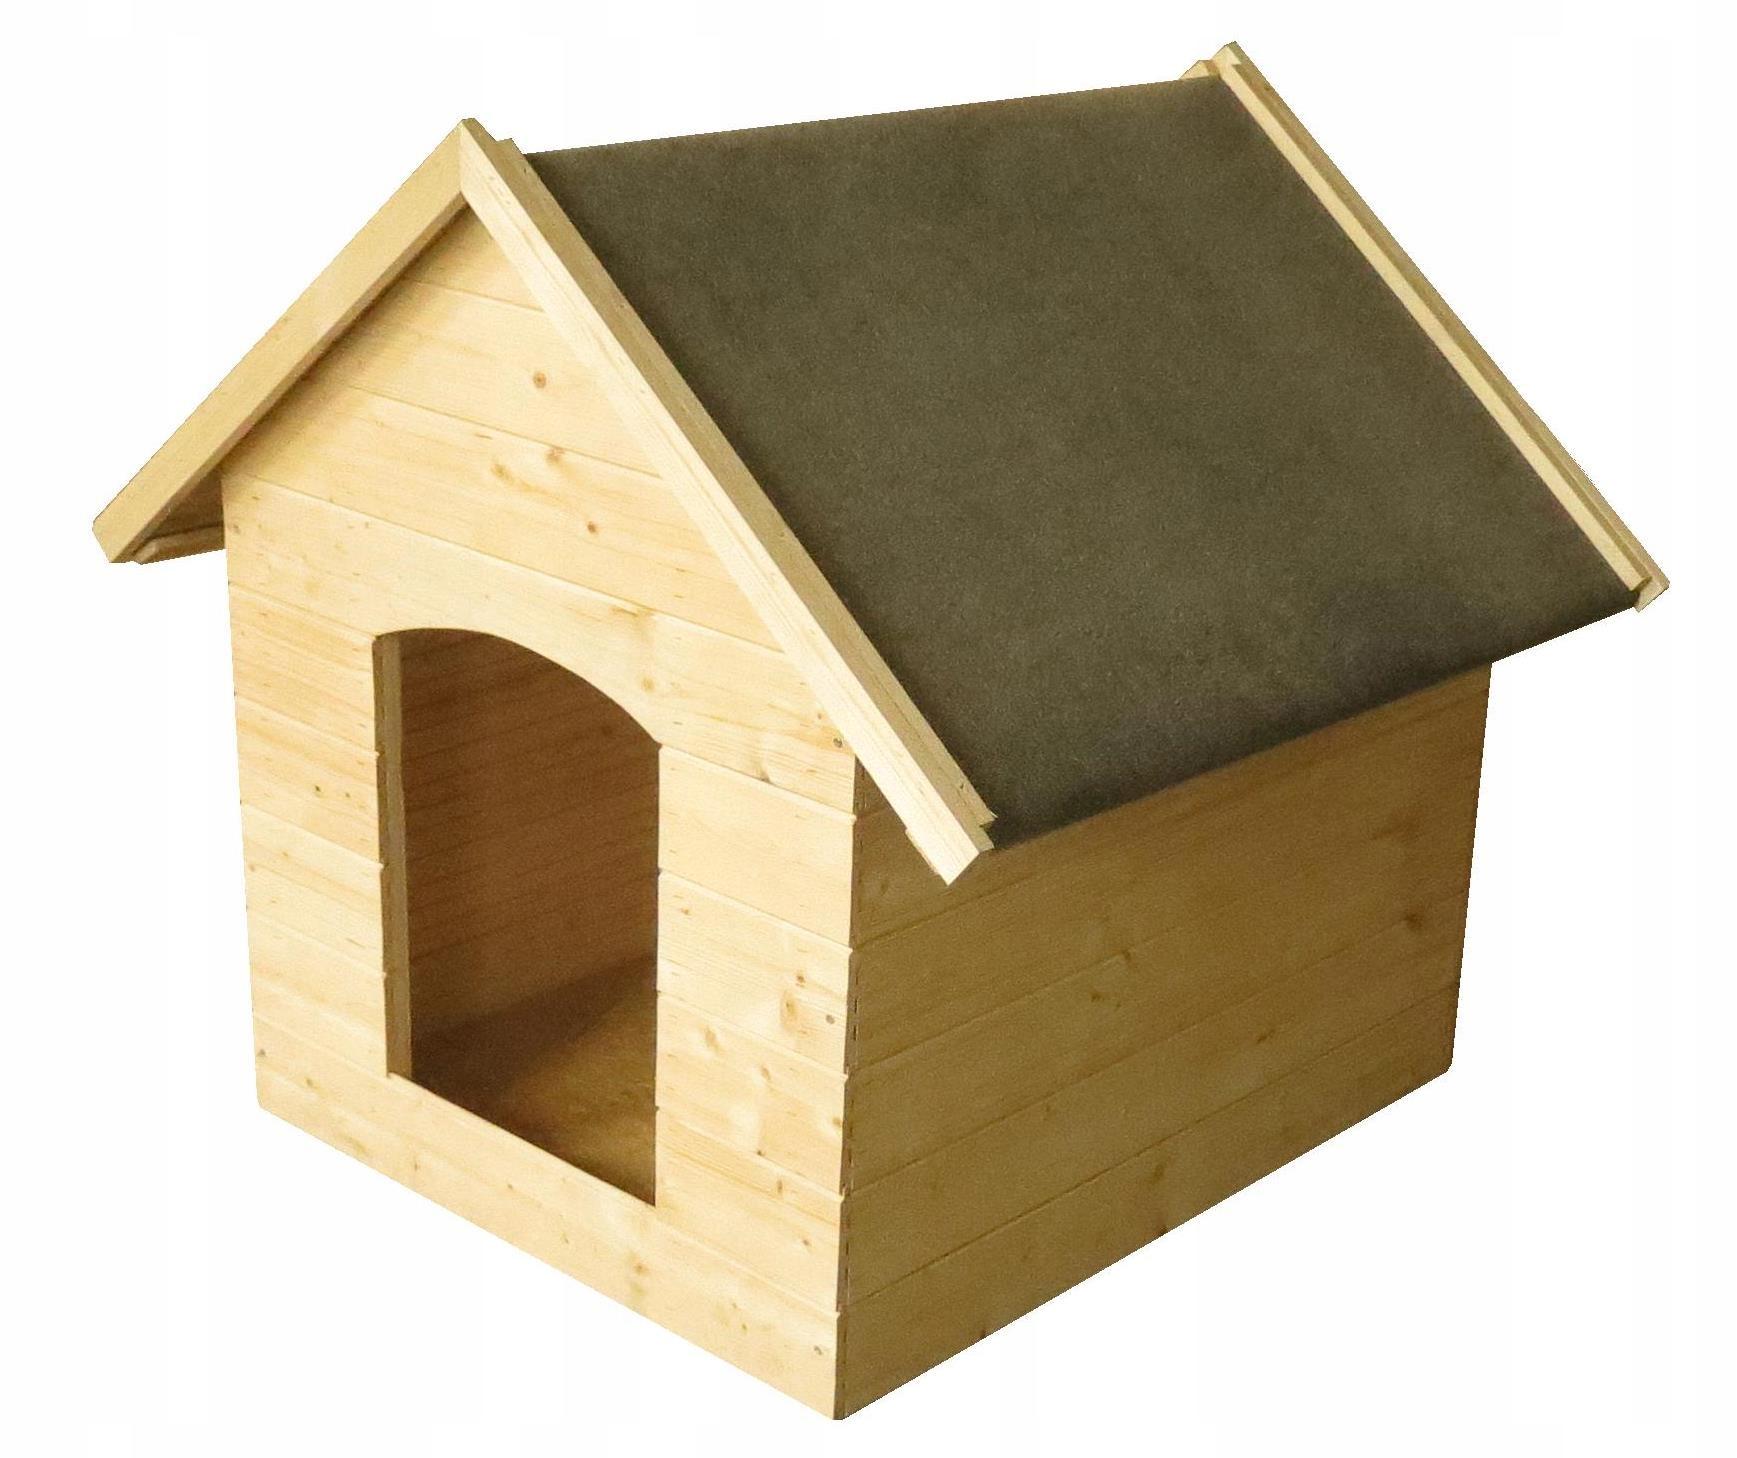 Timbela M402 Drewniana buda dla psa - 0.5 m²